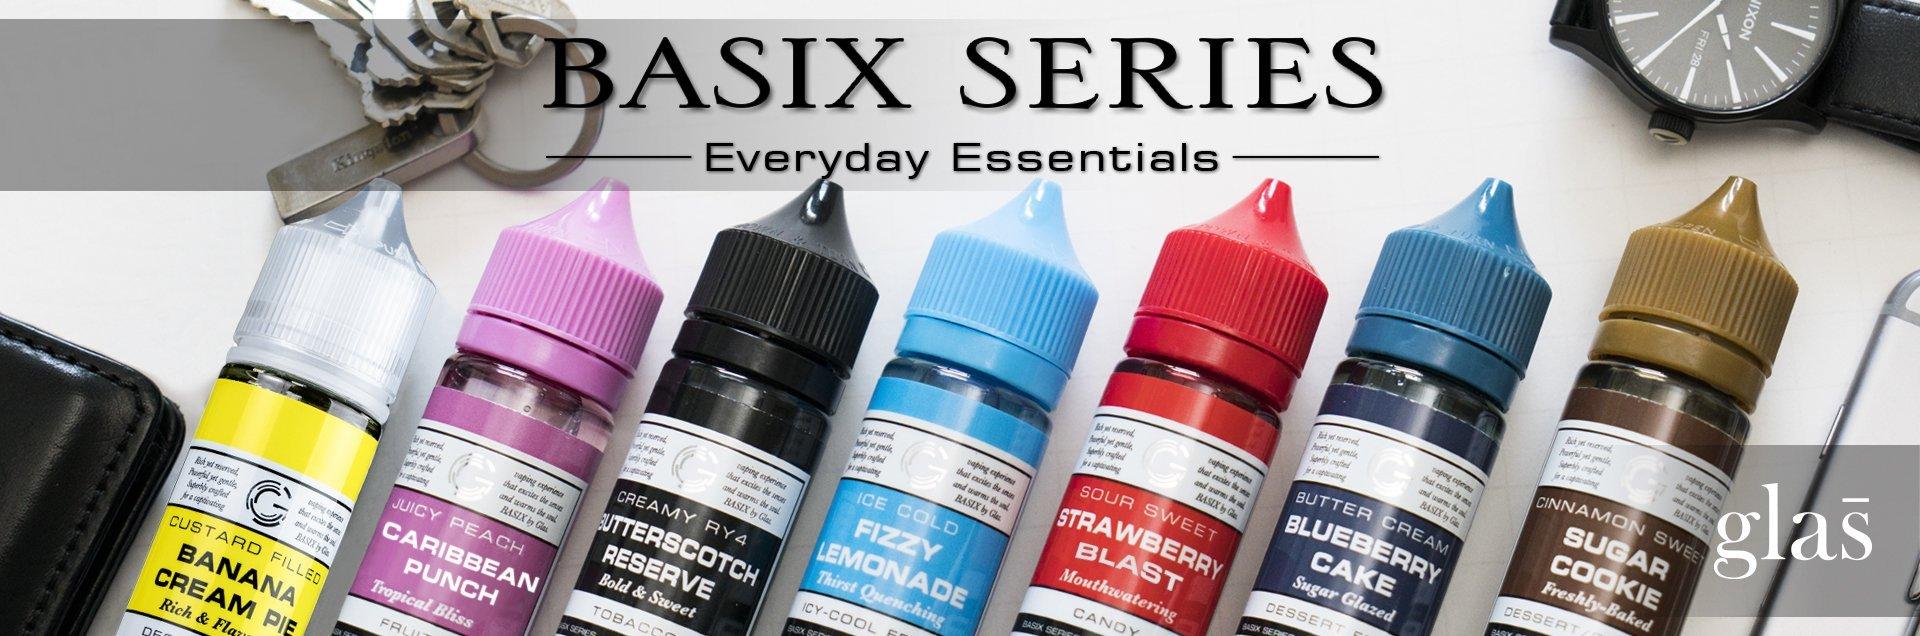 basix-glas-e-liquid-banner